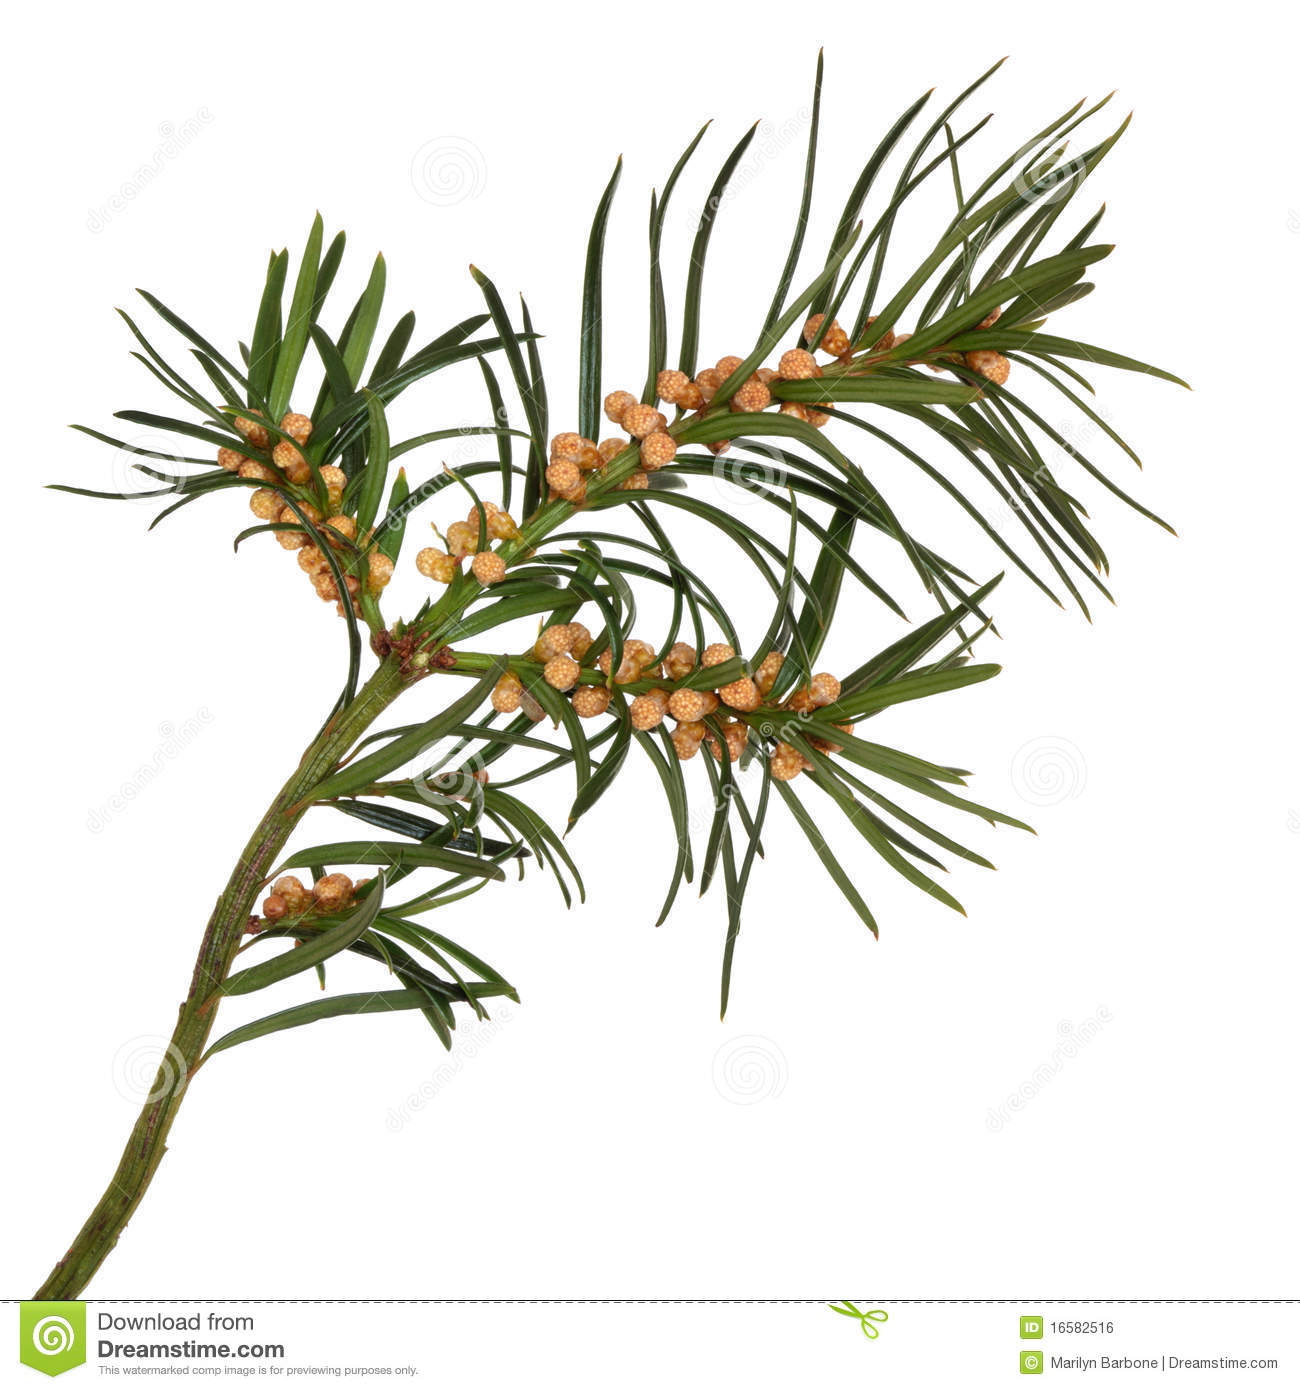 Yew Leaf Sprig Royalty Free Stock Image.